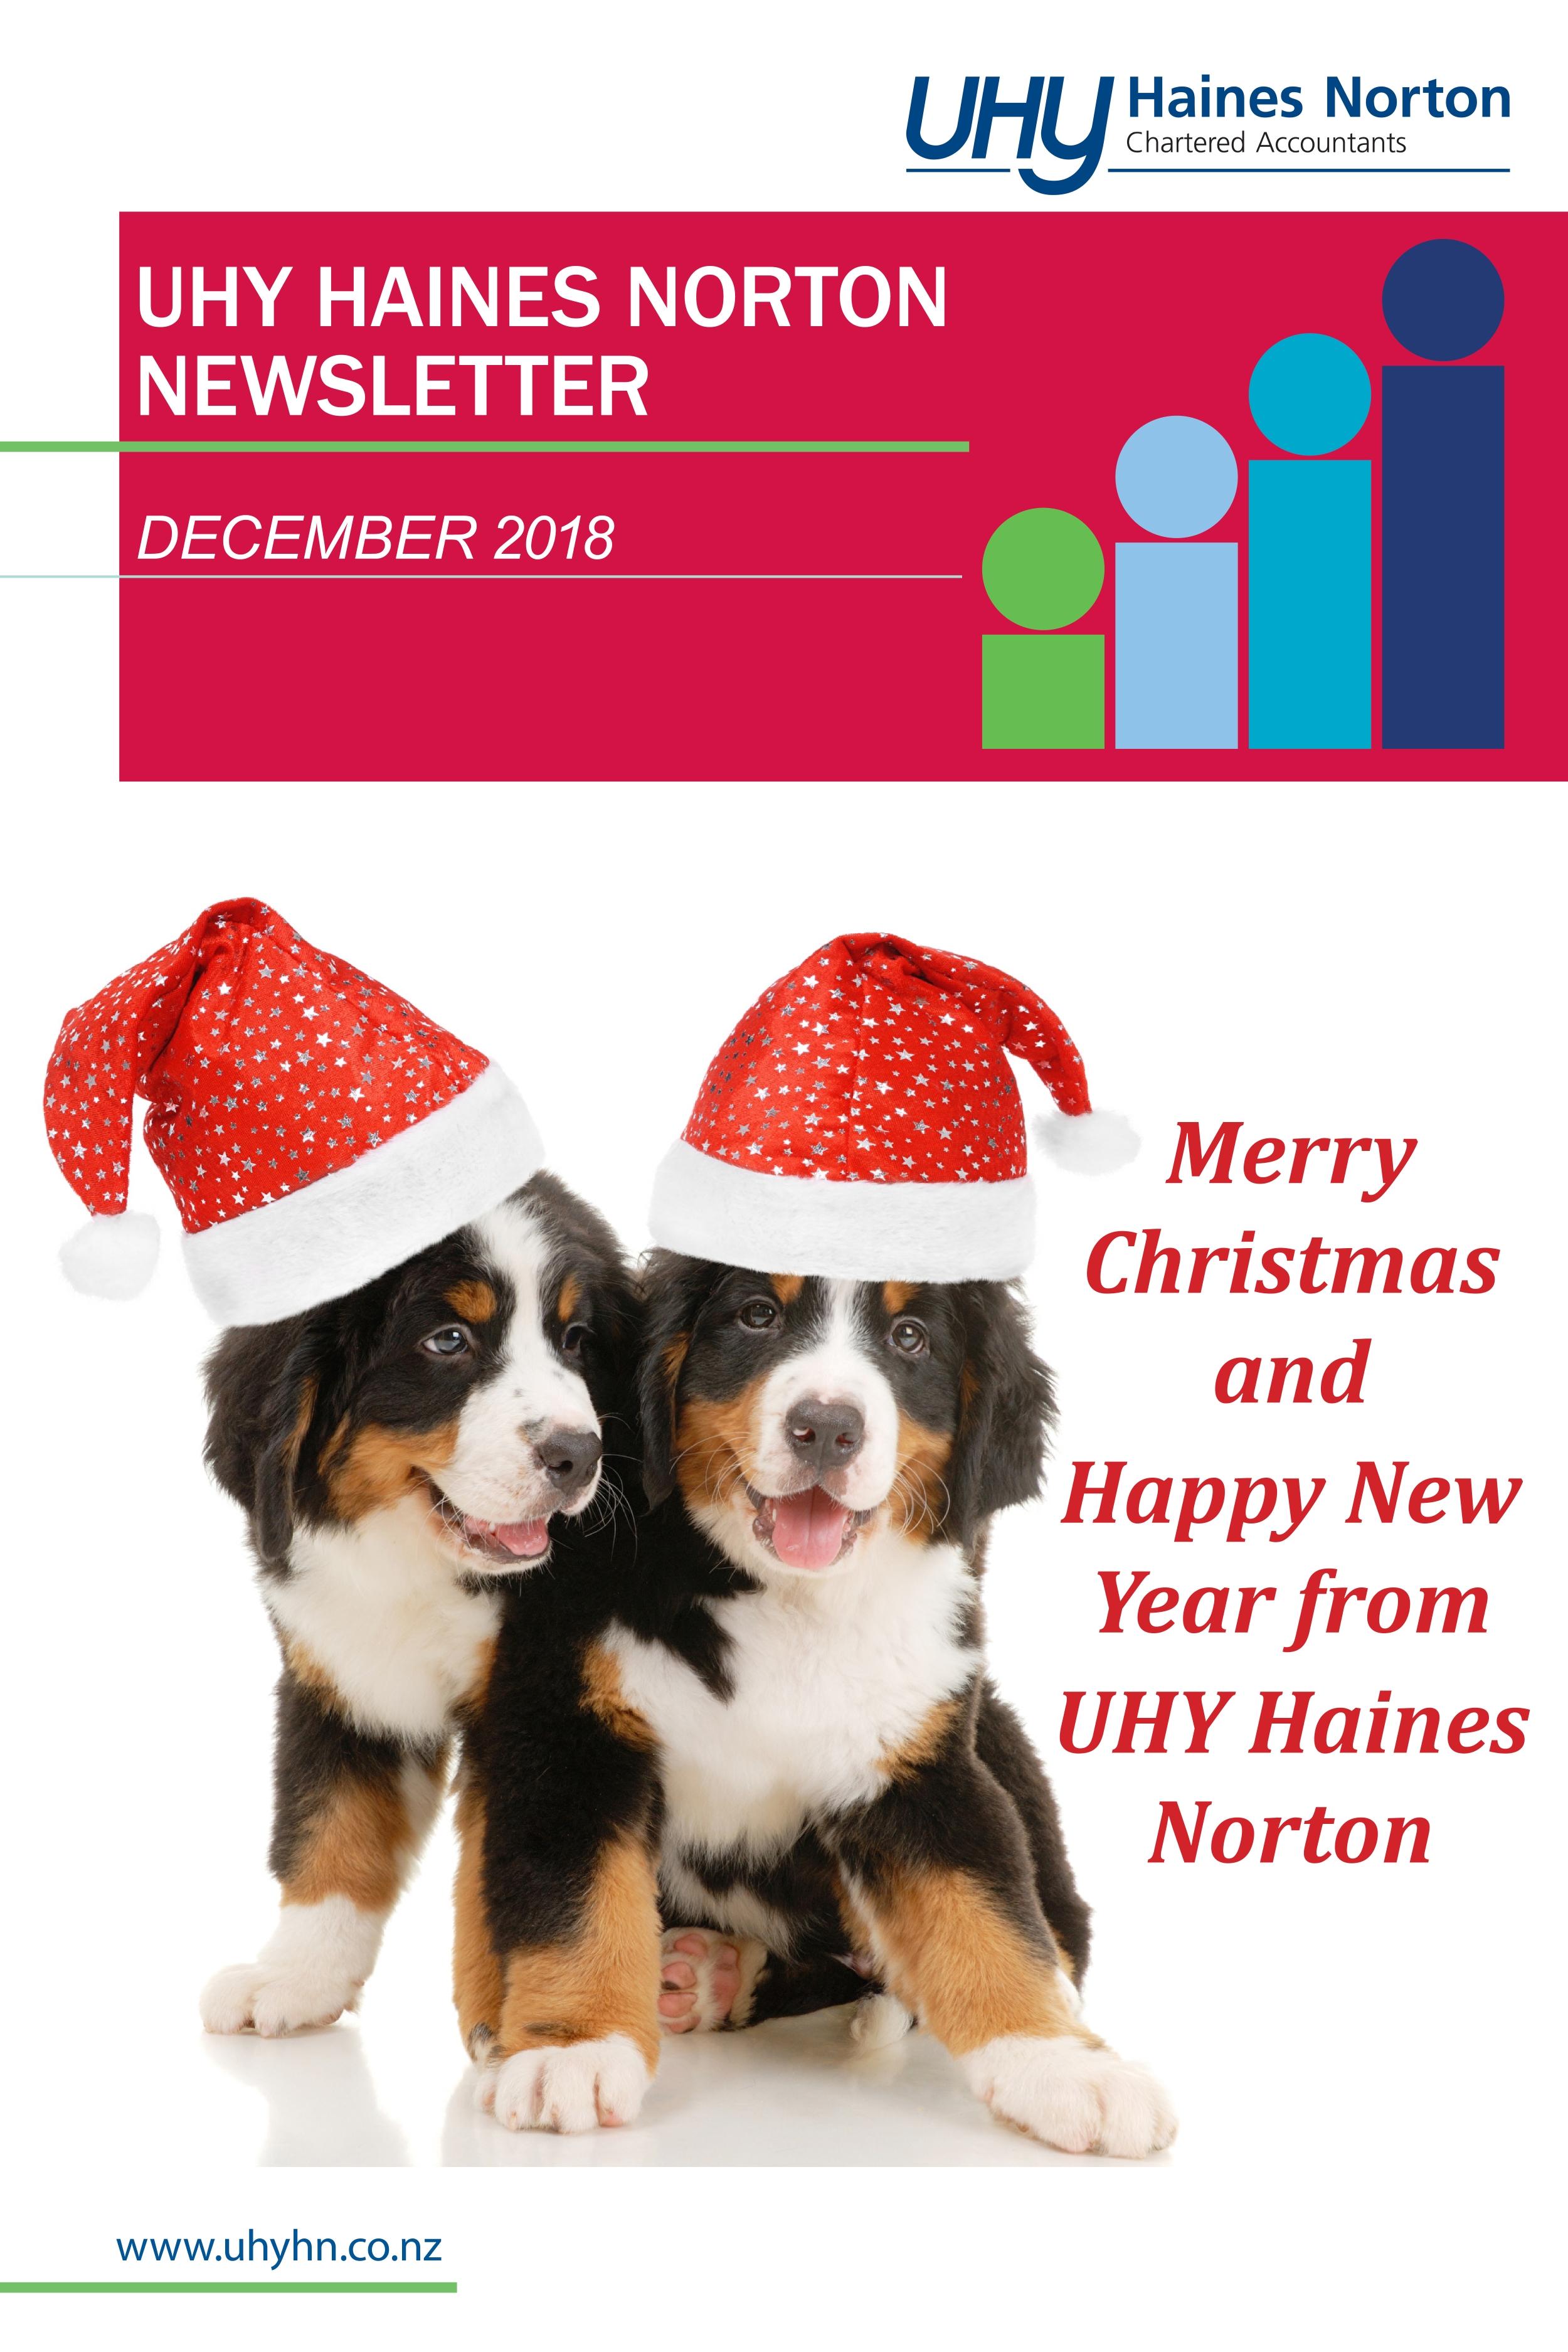 UHY Haines Norton Newsletter December 2018